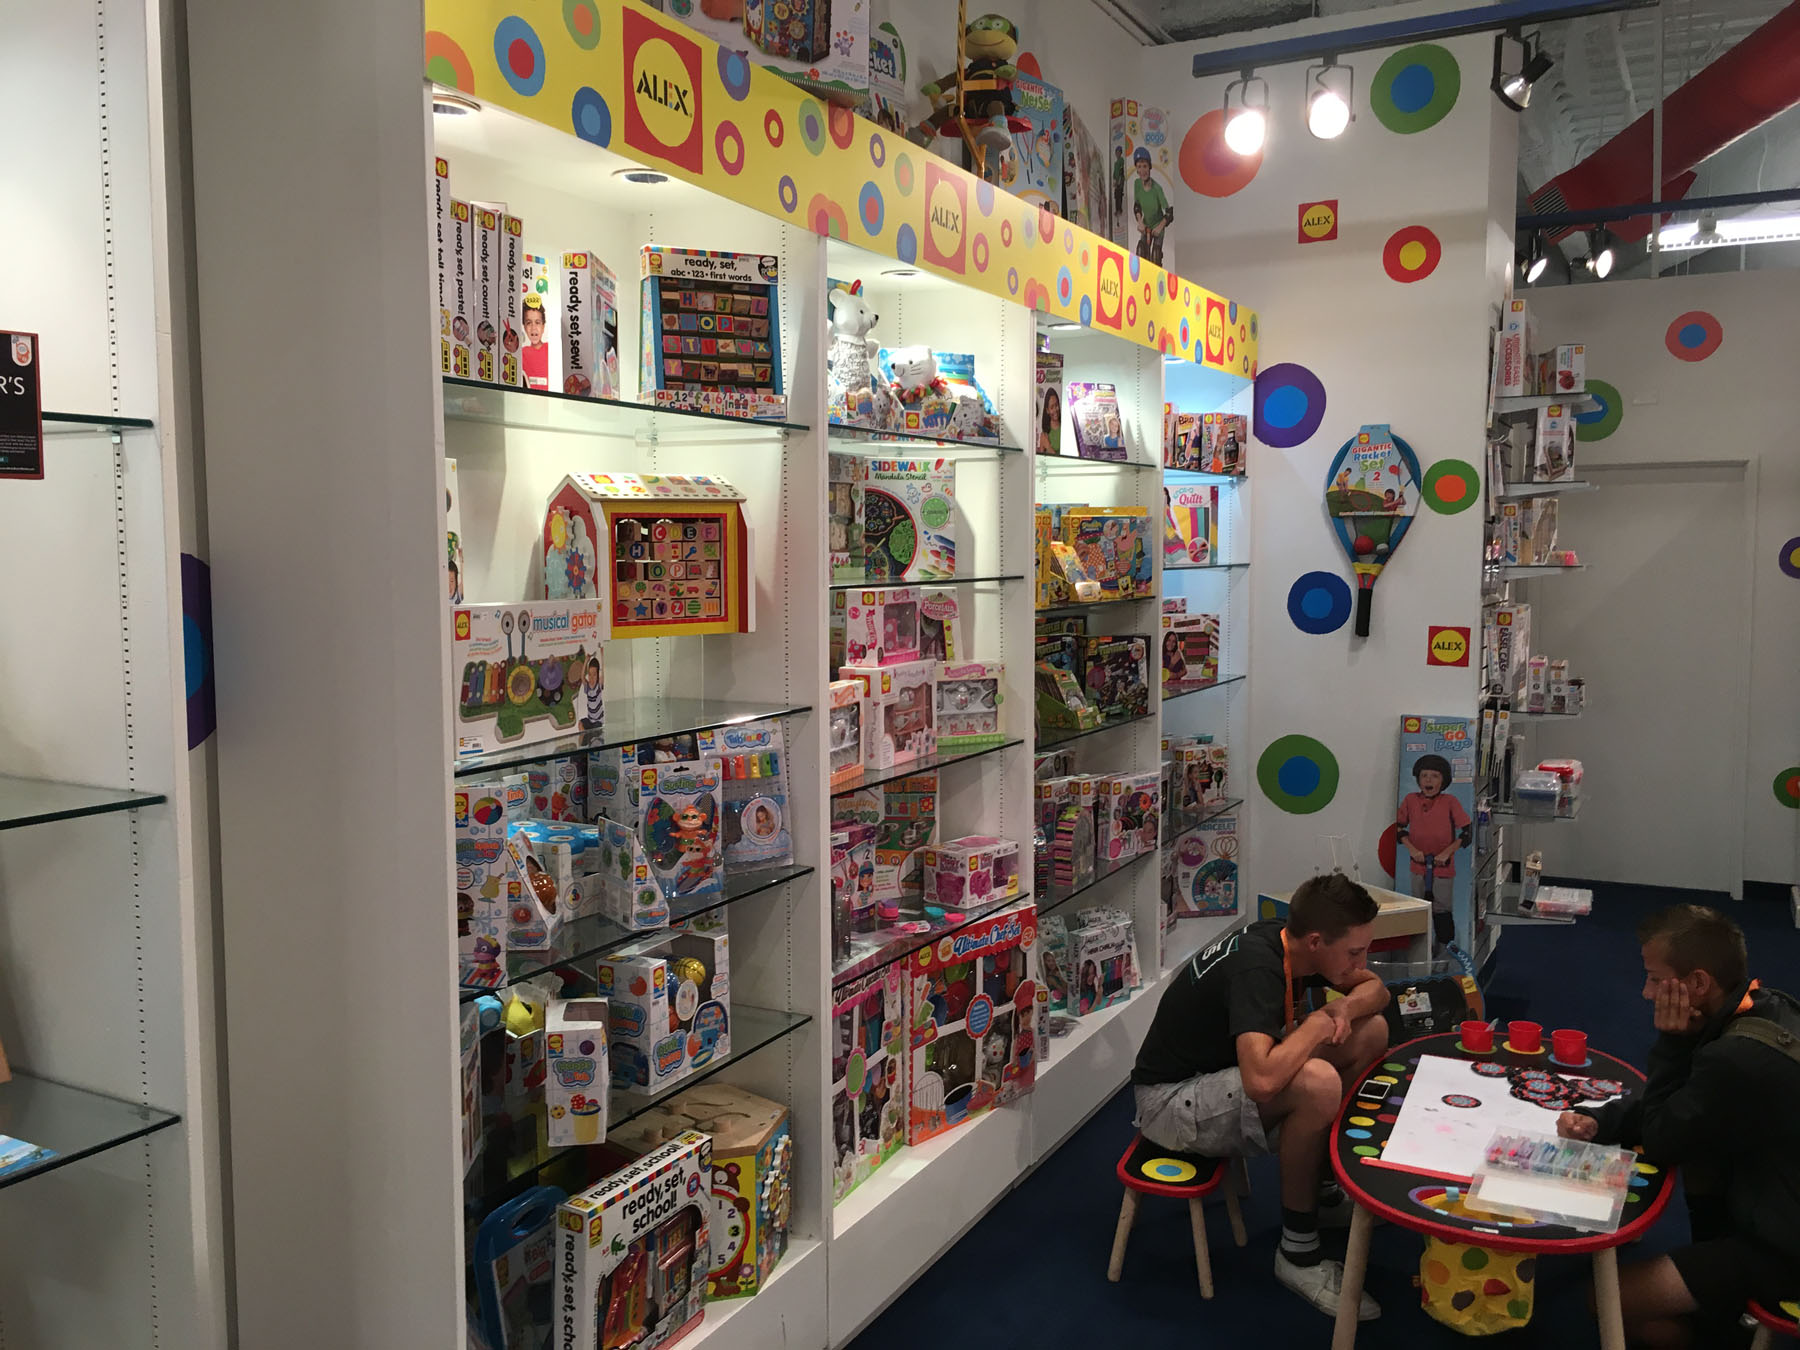 Las Vegas Nv Showroom Toyology